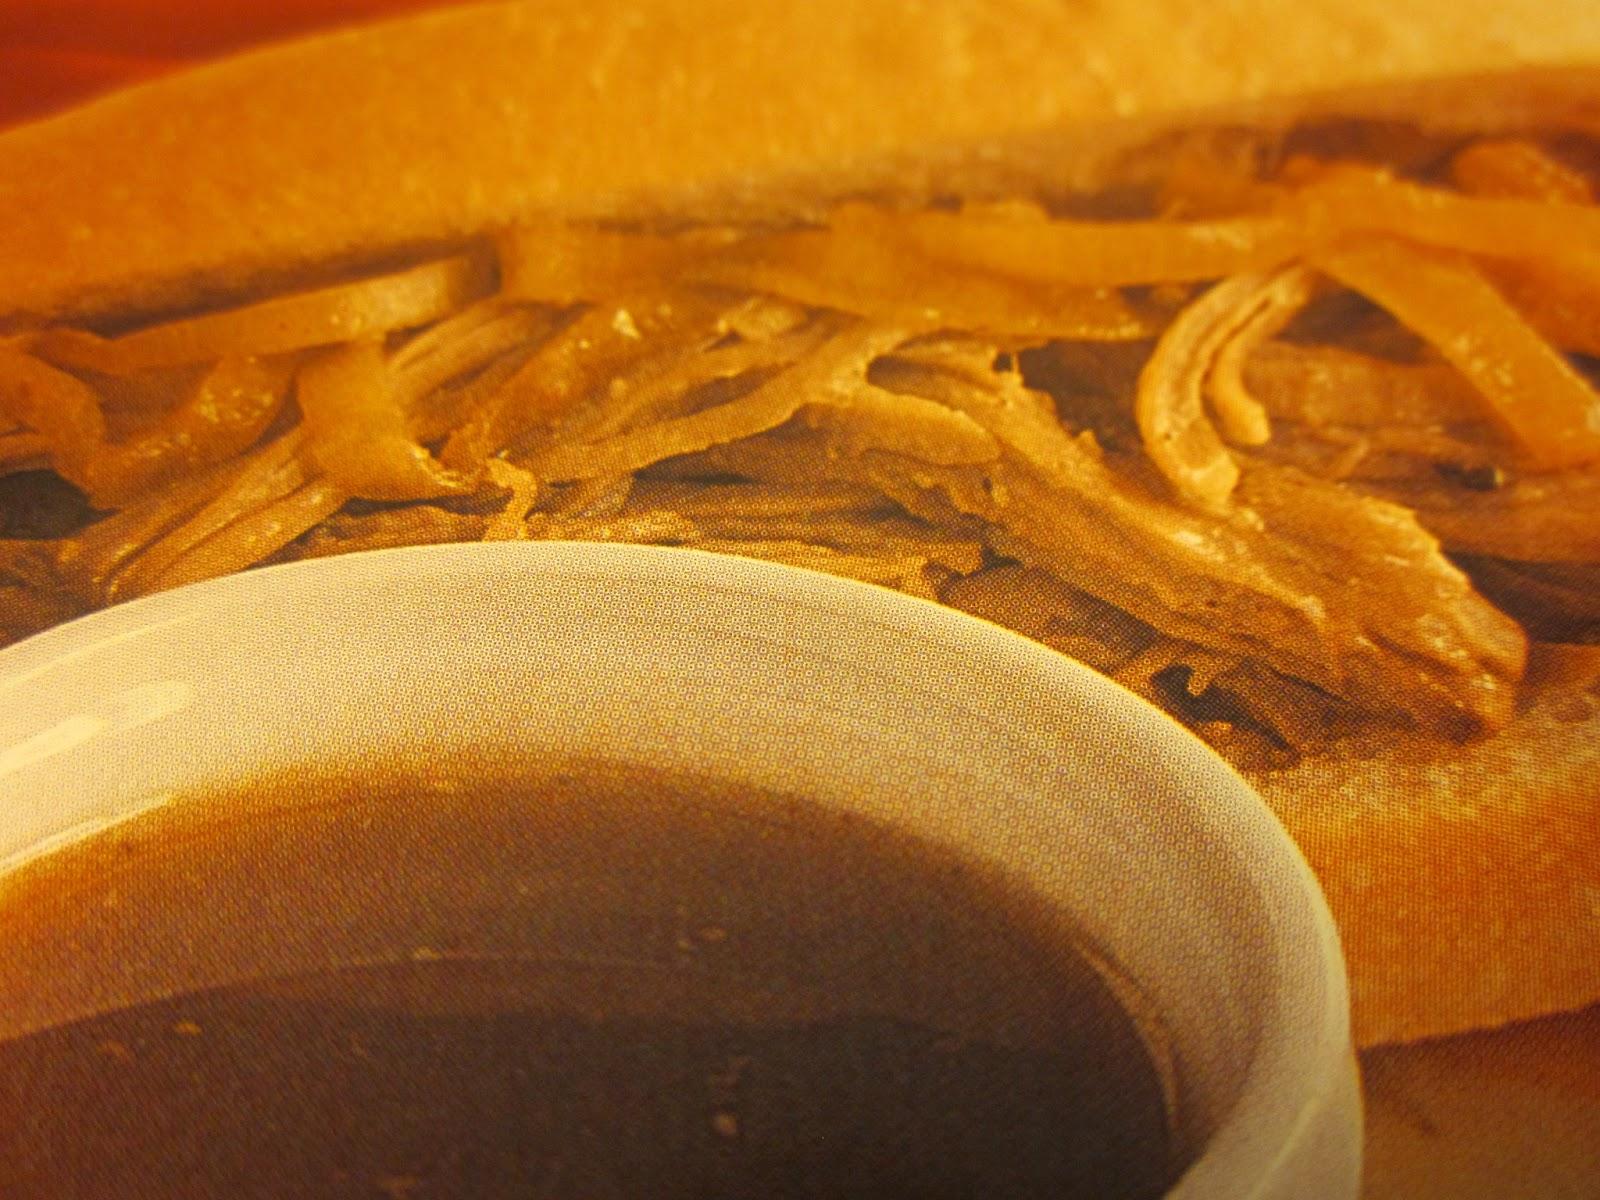 GRANDMA'S SLOW COOKER RECIPES: FIESTA PORK SANDWICHES